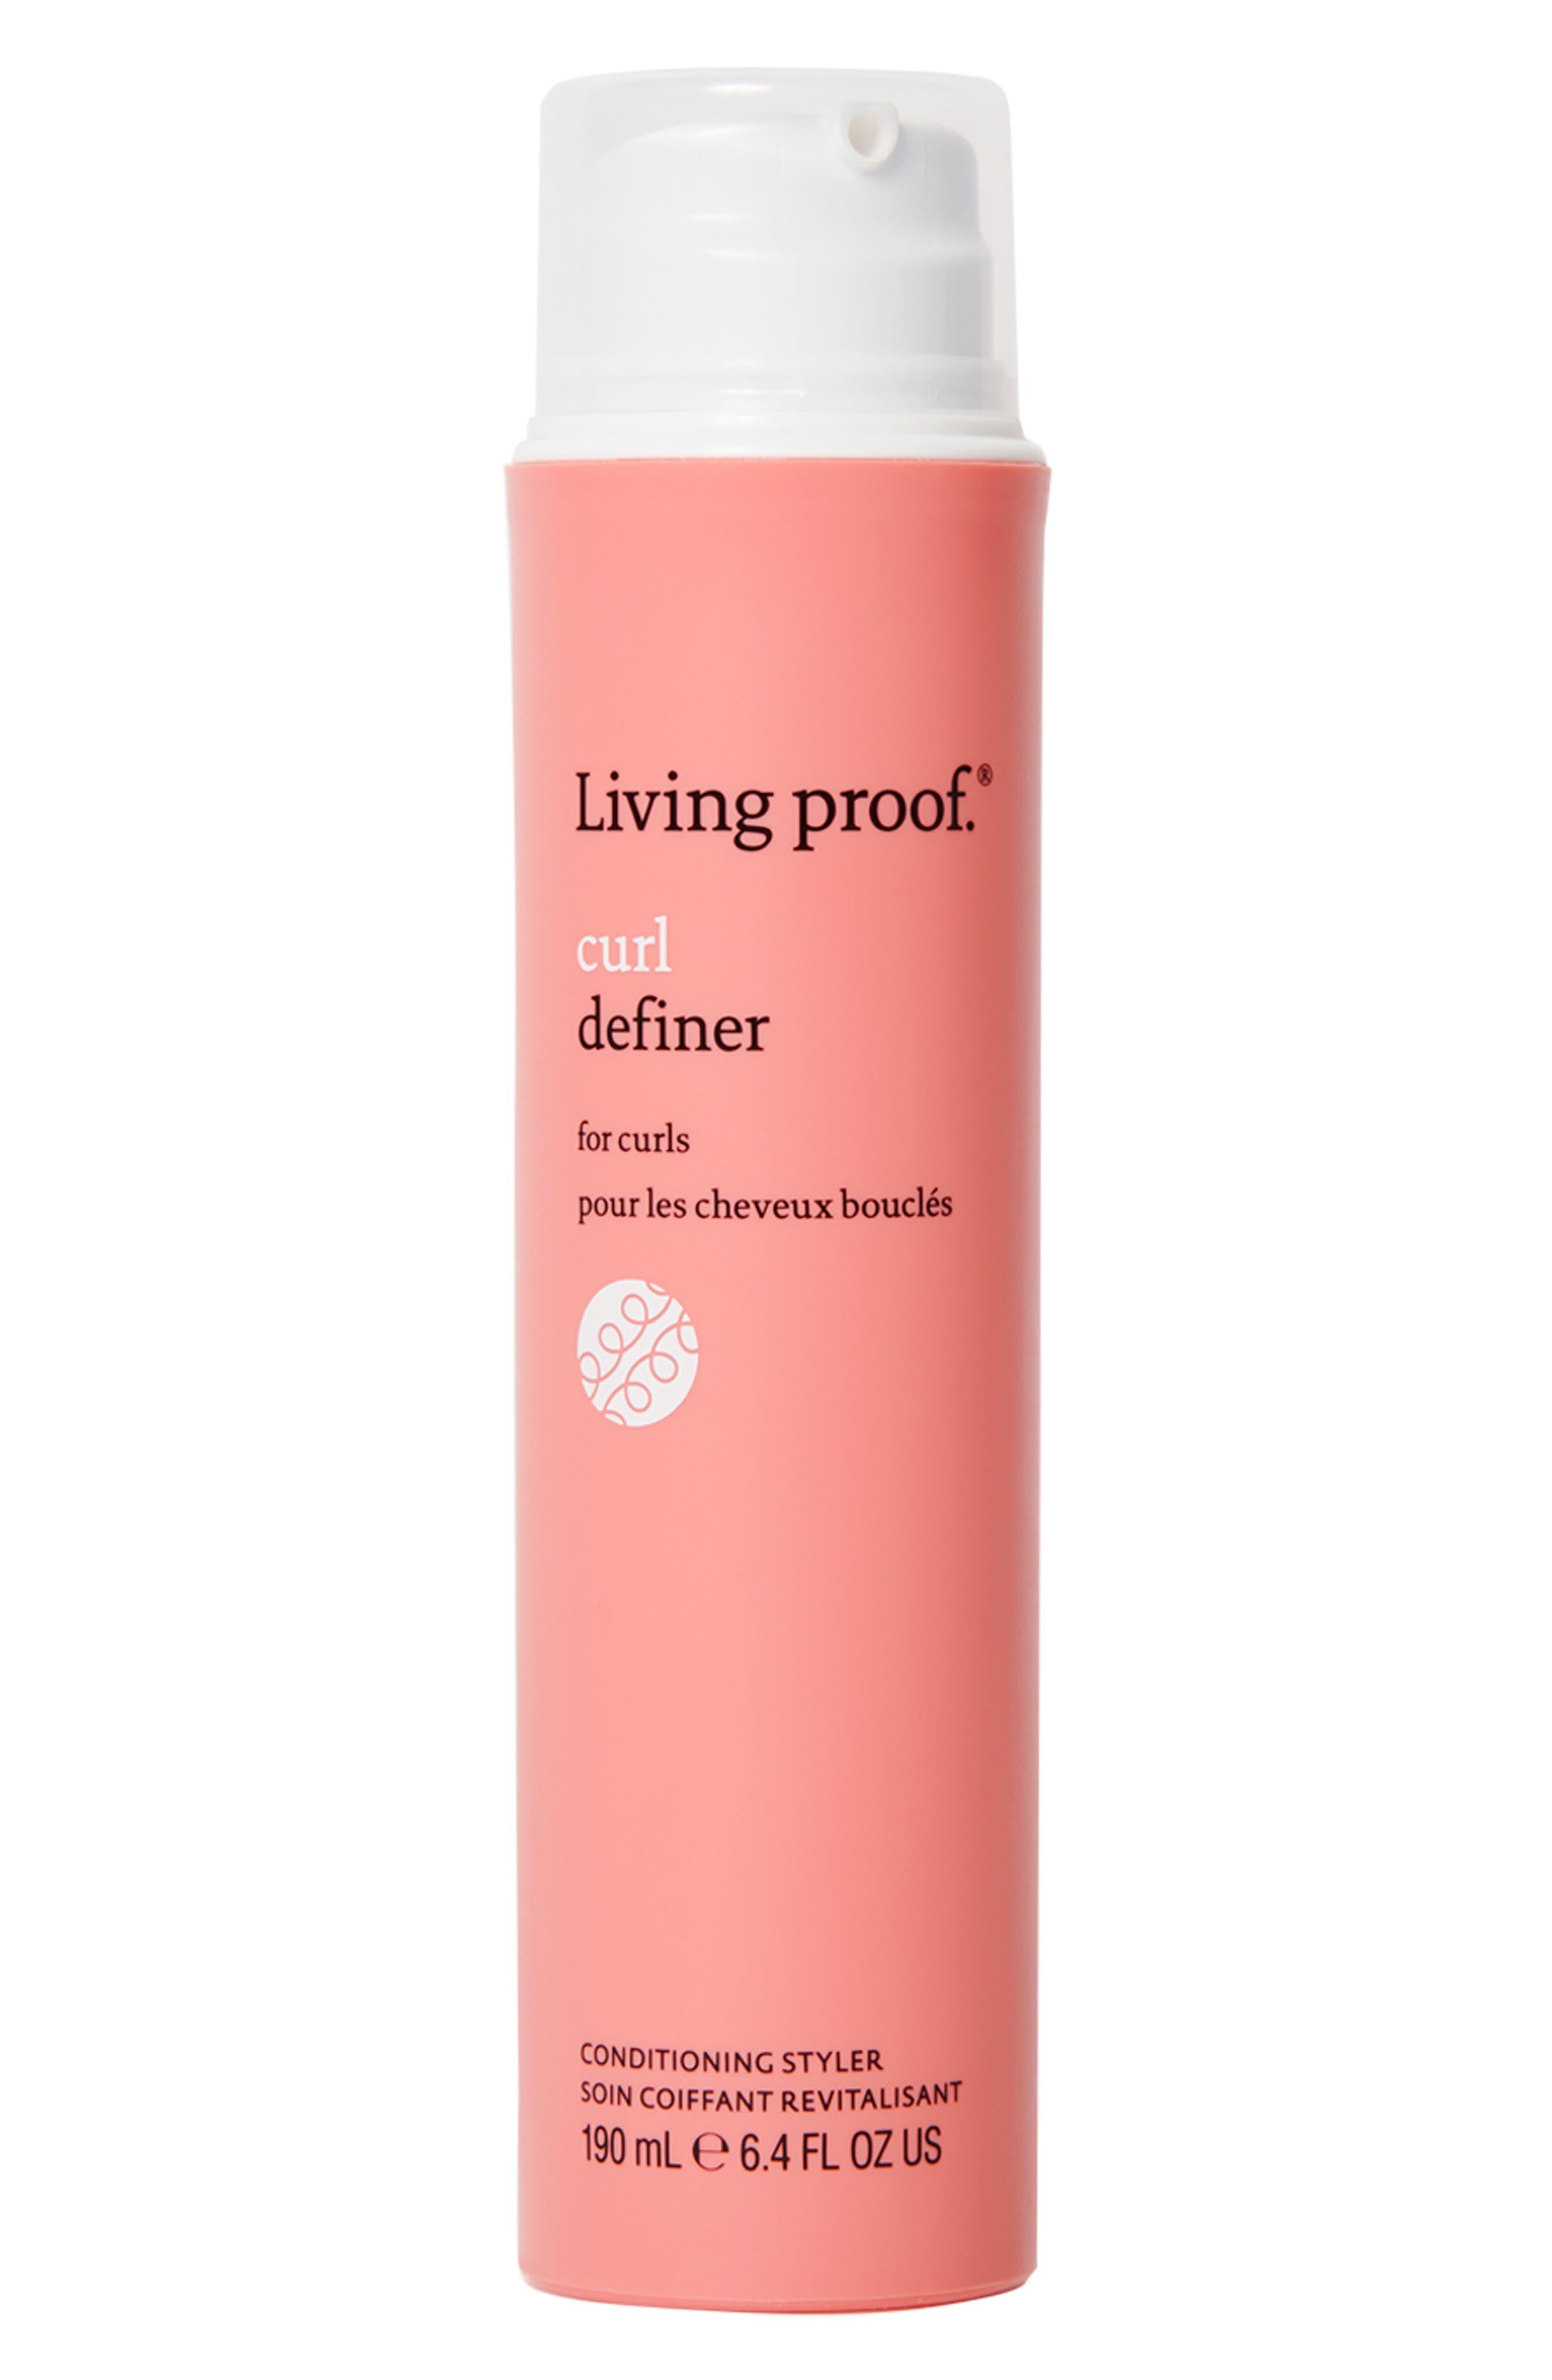 Living Proof Curl Definer